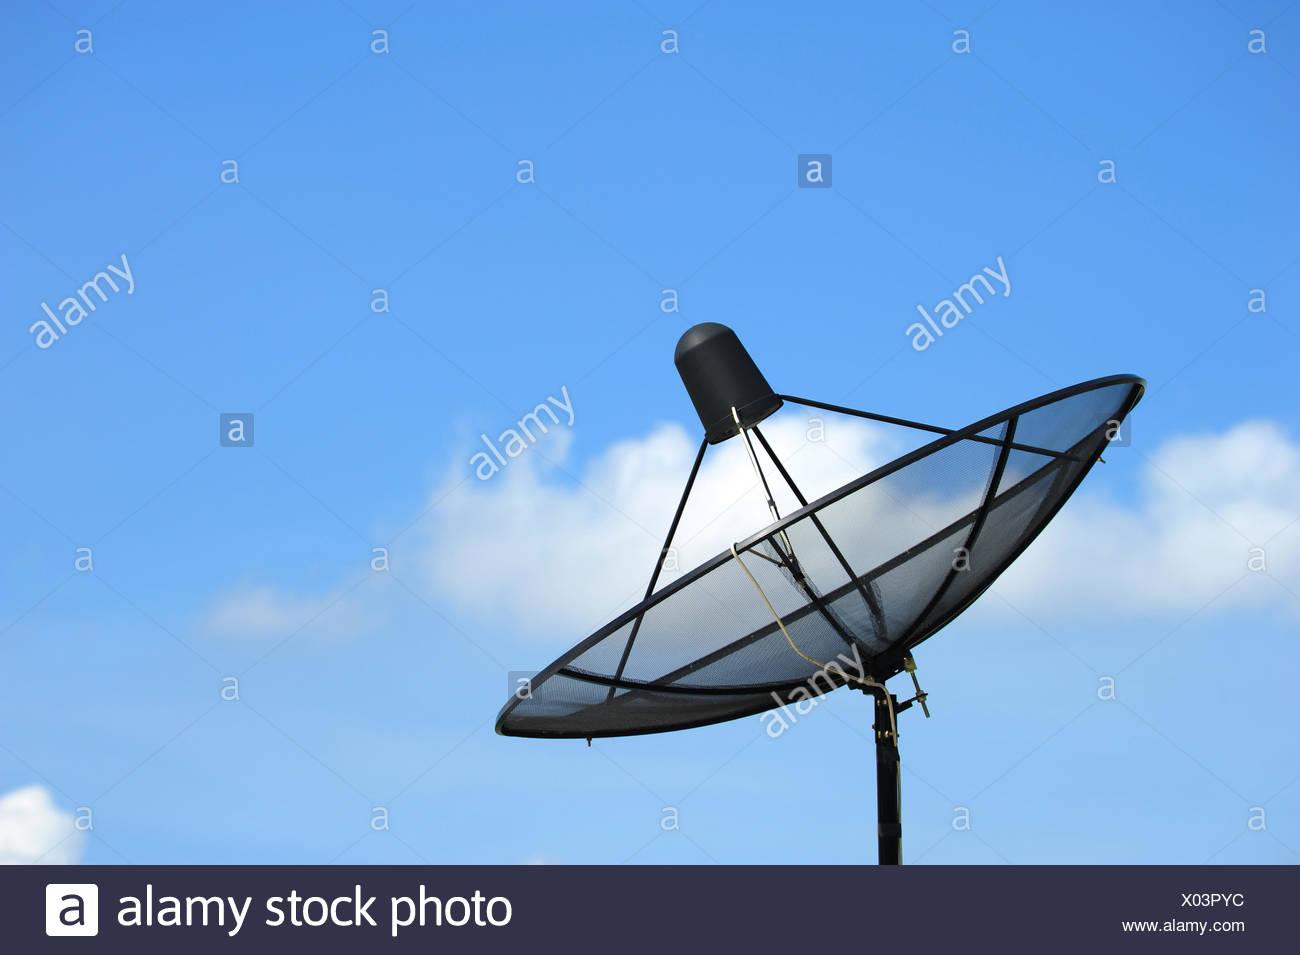 Satellite dish - Stock Image